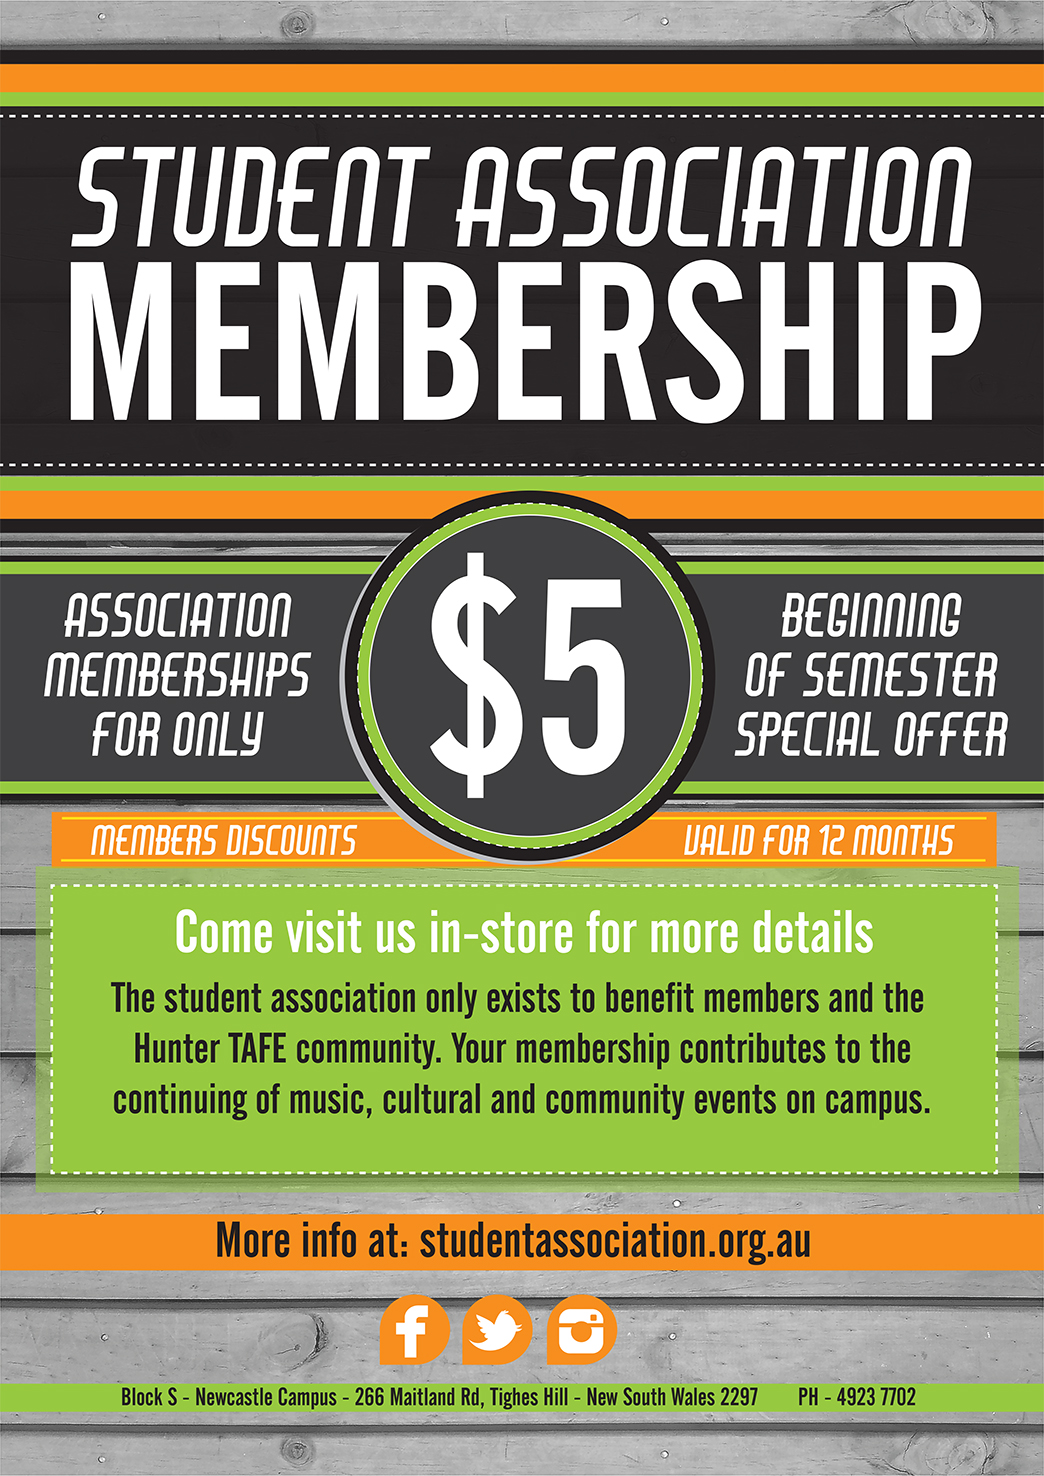 Student Association Membership